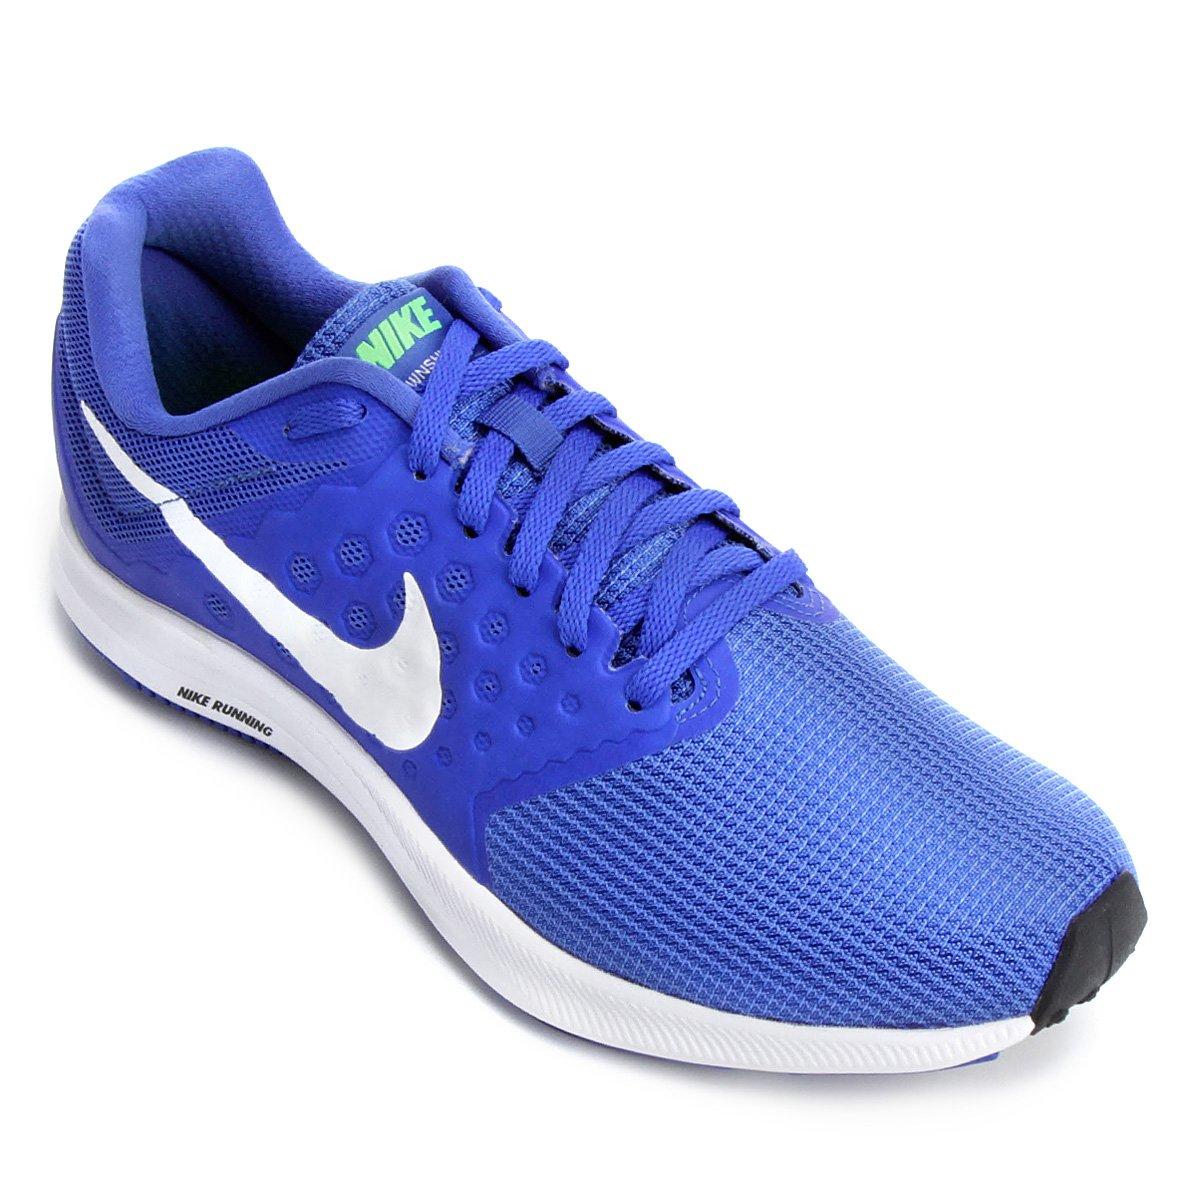 6213669d35a Tênis Nike Downshifter 7 Masculino - Compre Agora